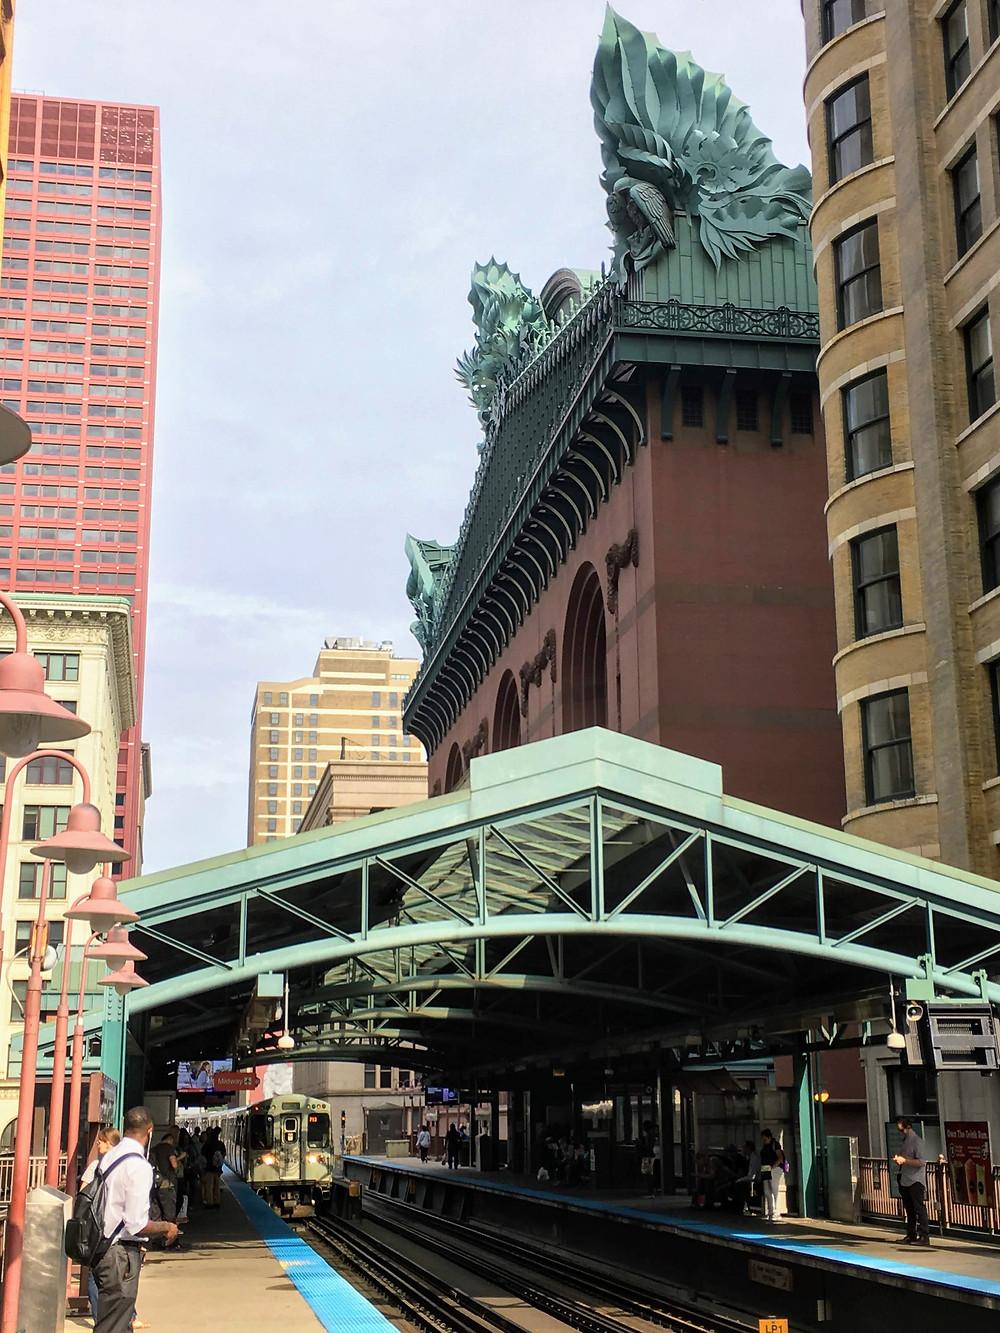 Chicago trains trams public transportation Illinois